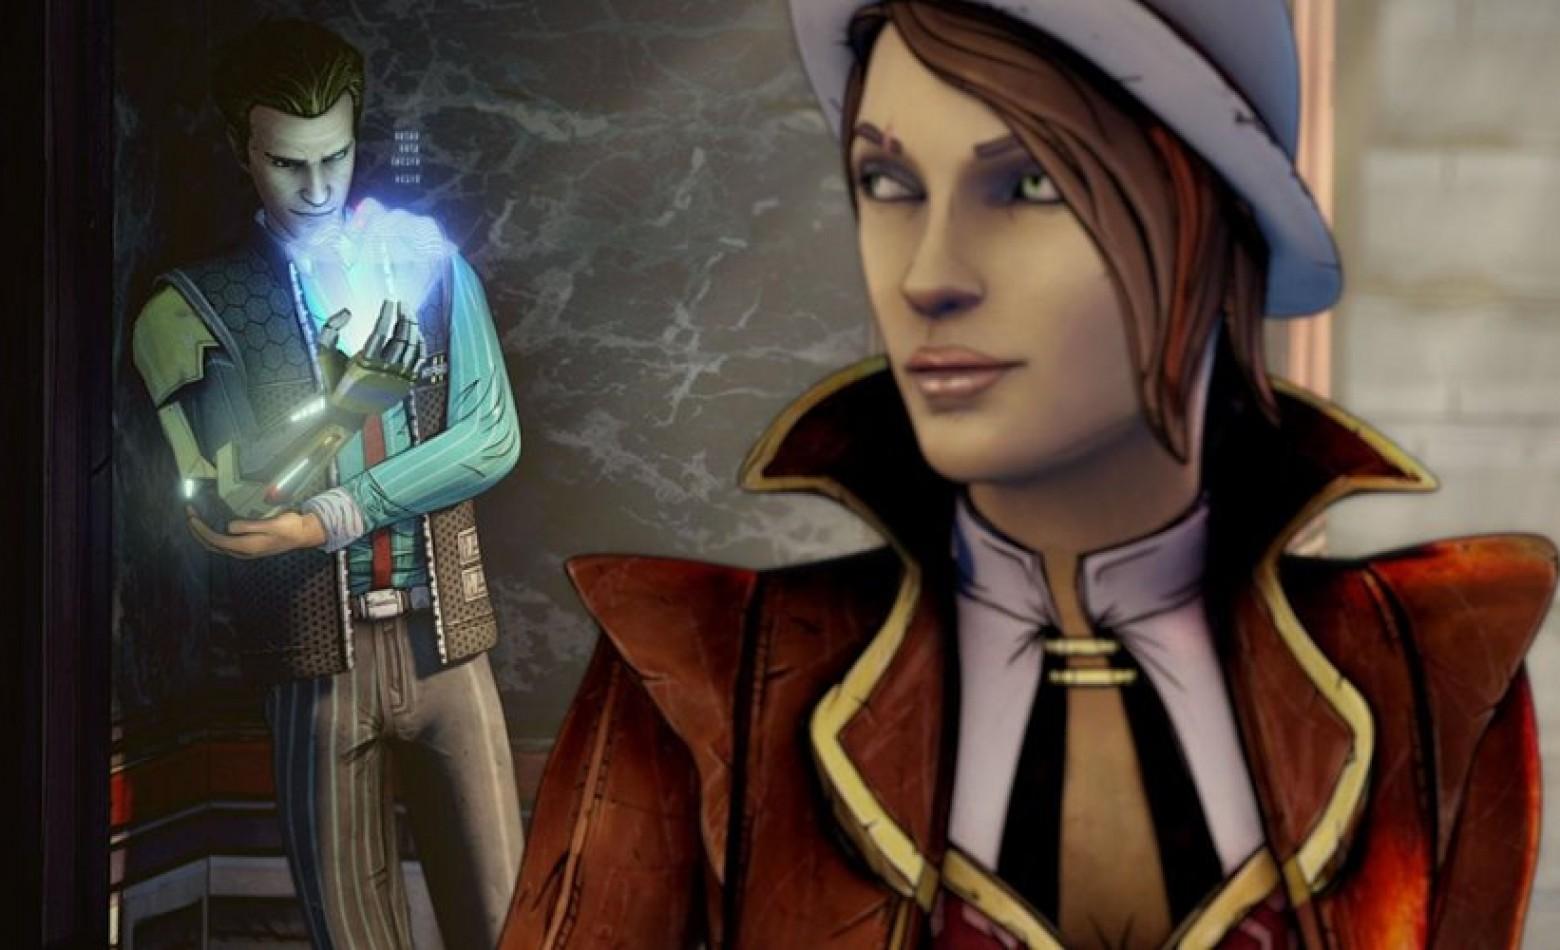 Os bons tempos da Telltale com Tales from the Borderlands [Gameplay]